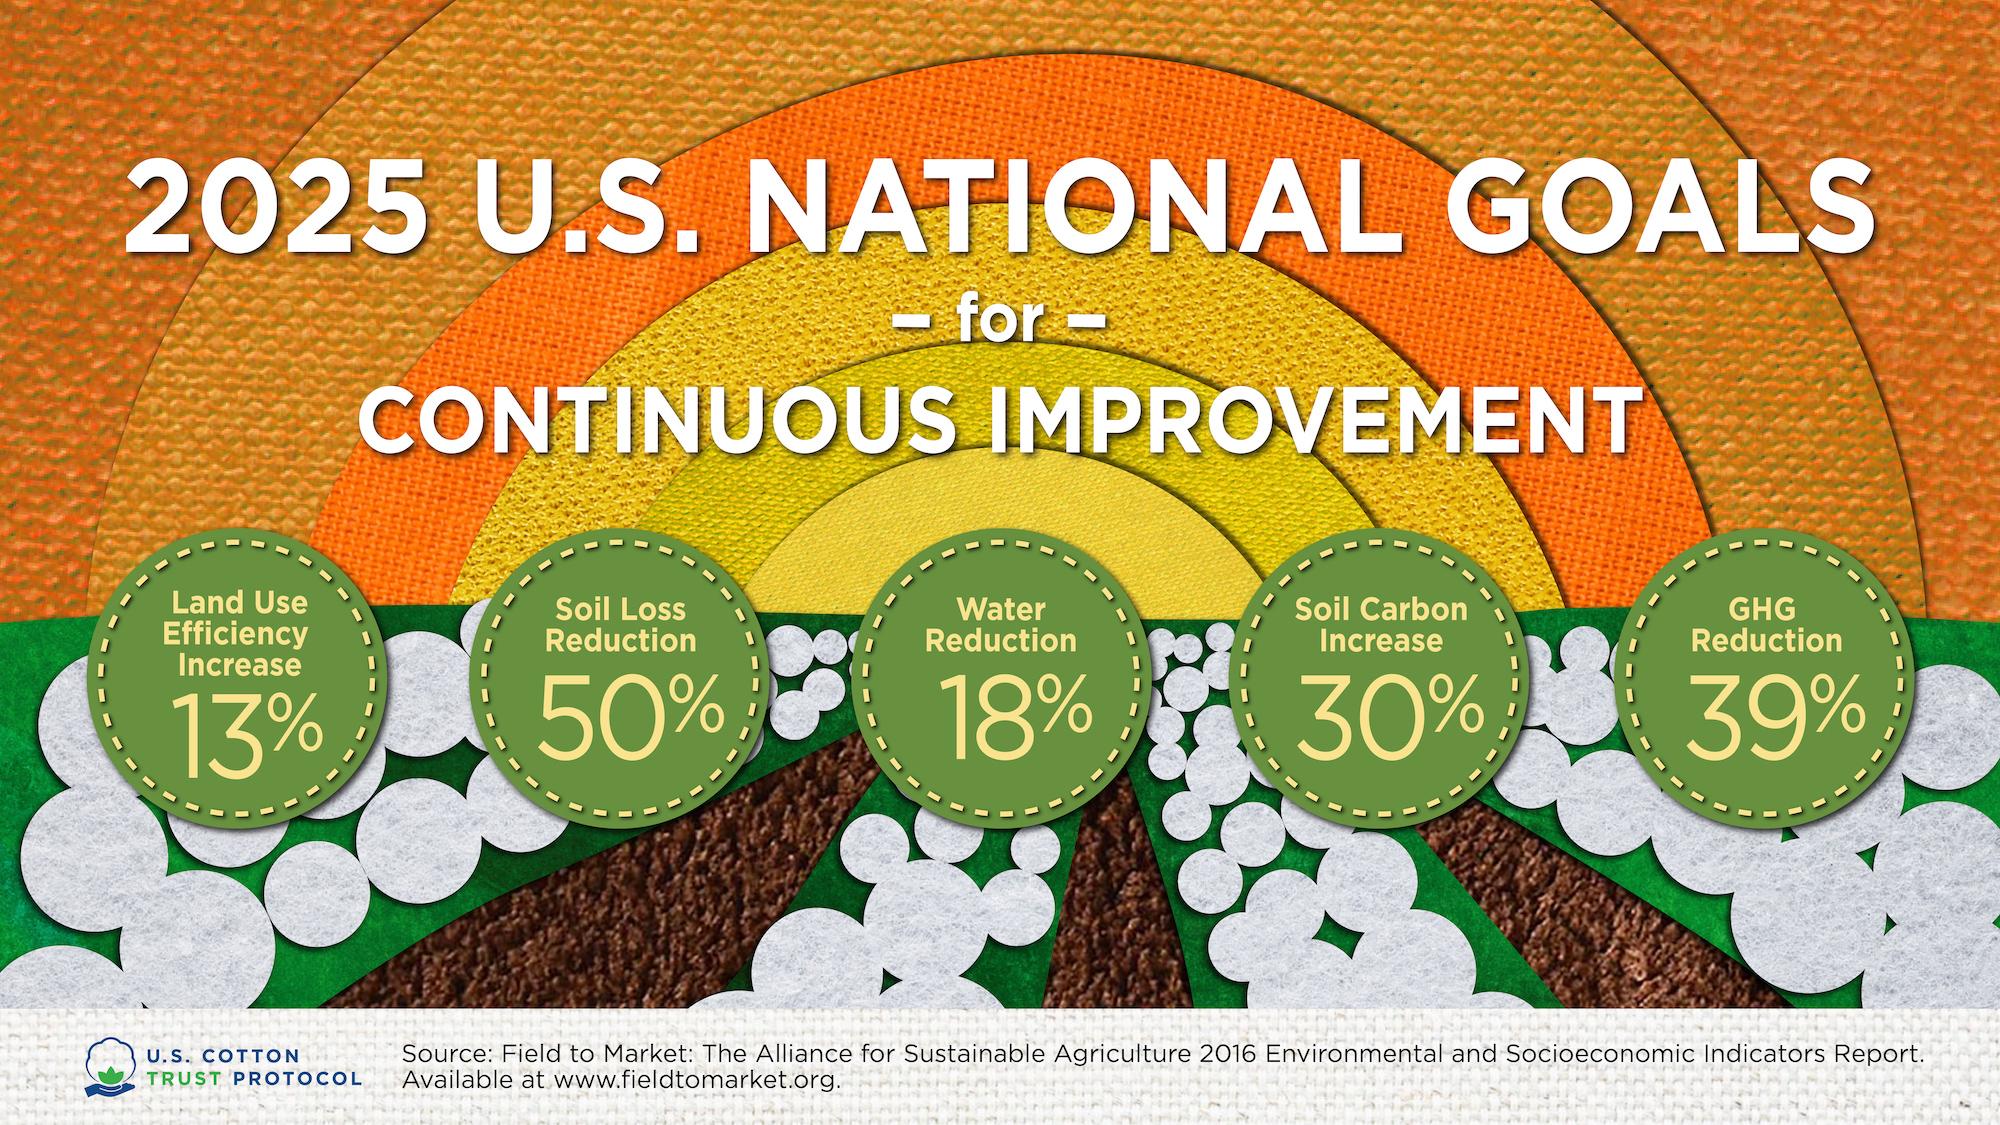 US Cotton Trust Protocol